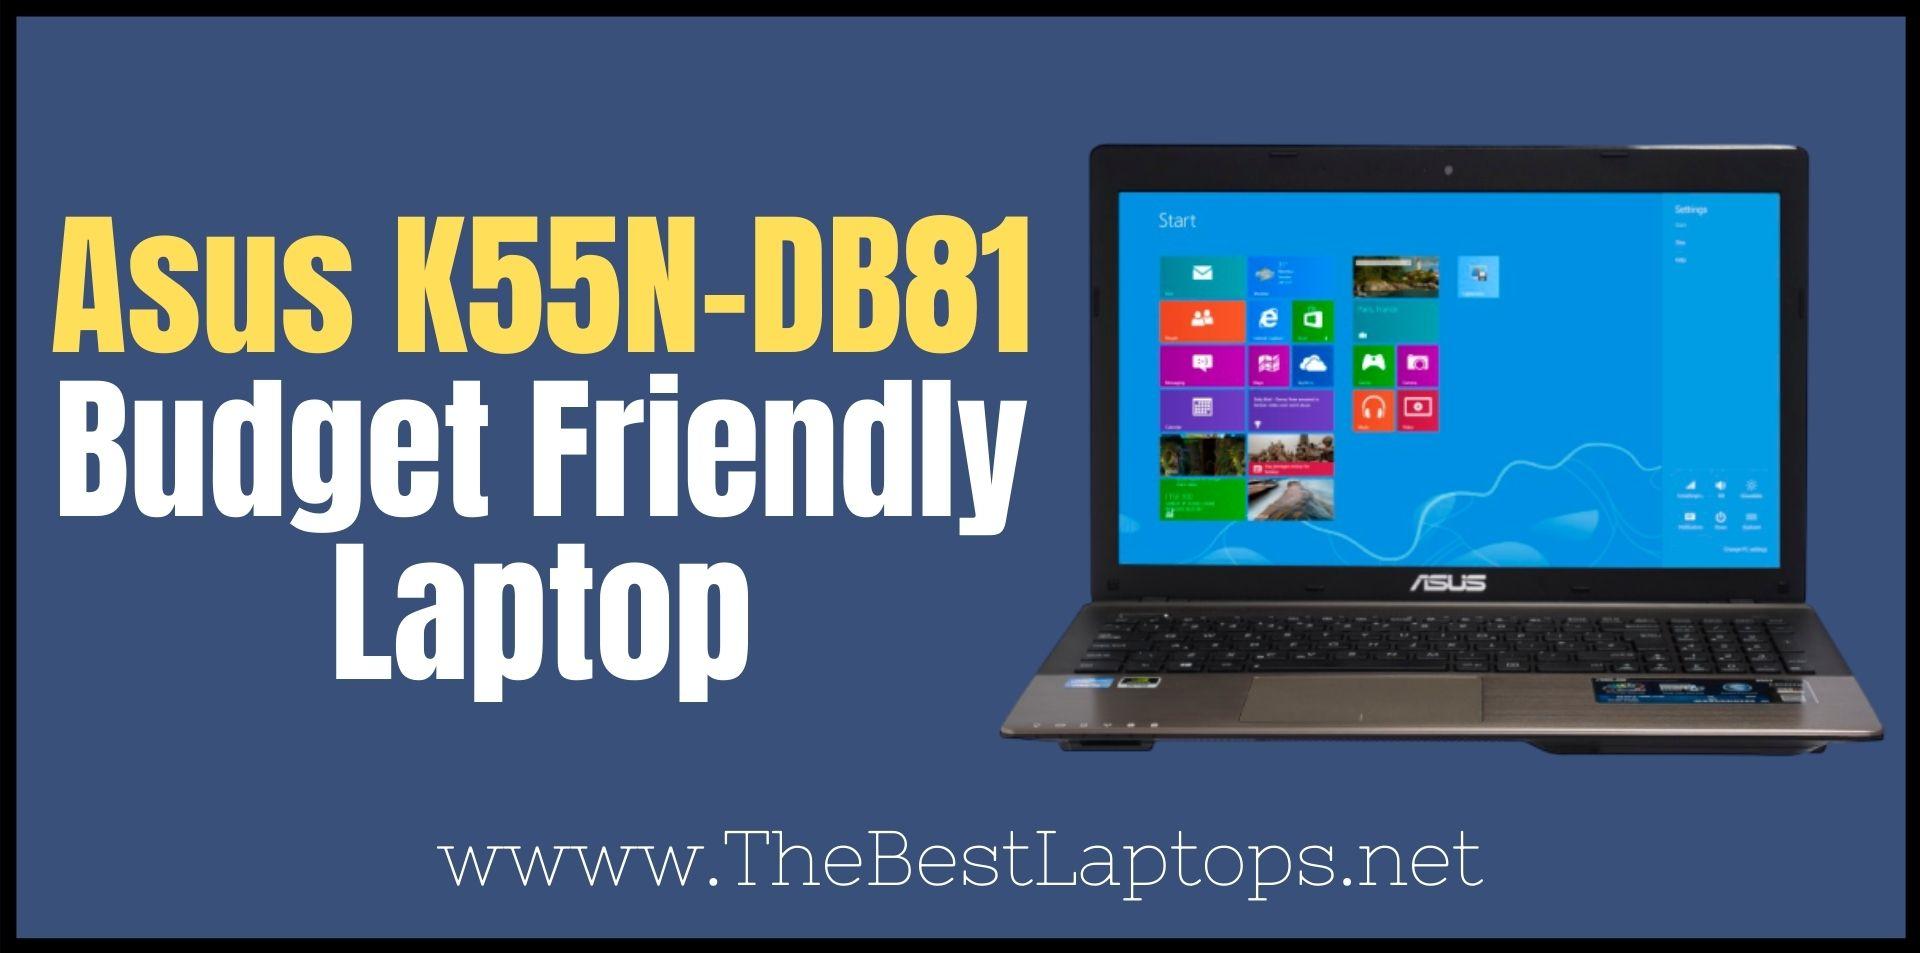 Asus K55N-DB81 Budget Friendly Laptop